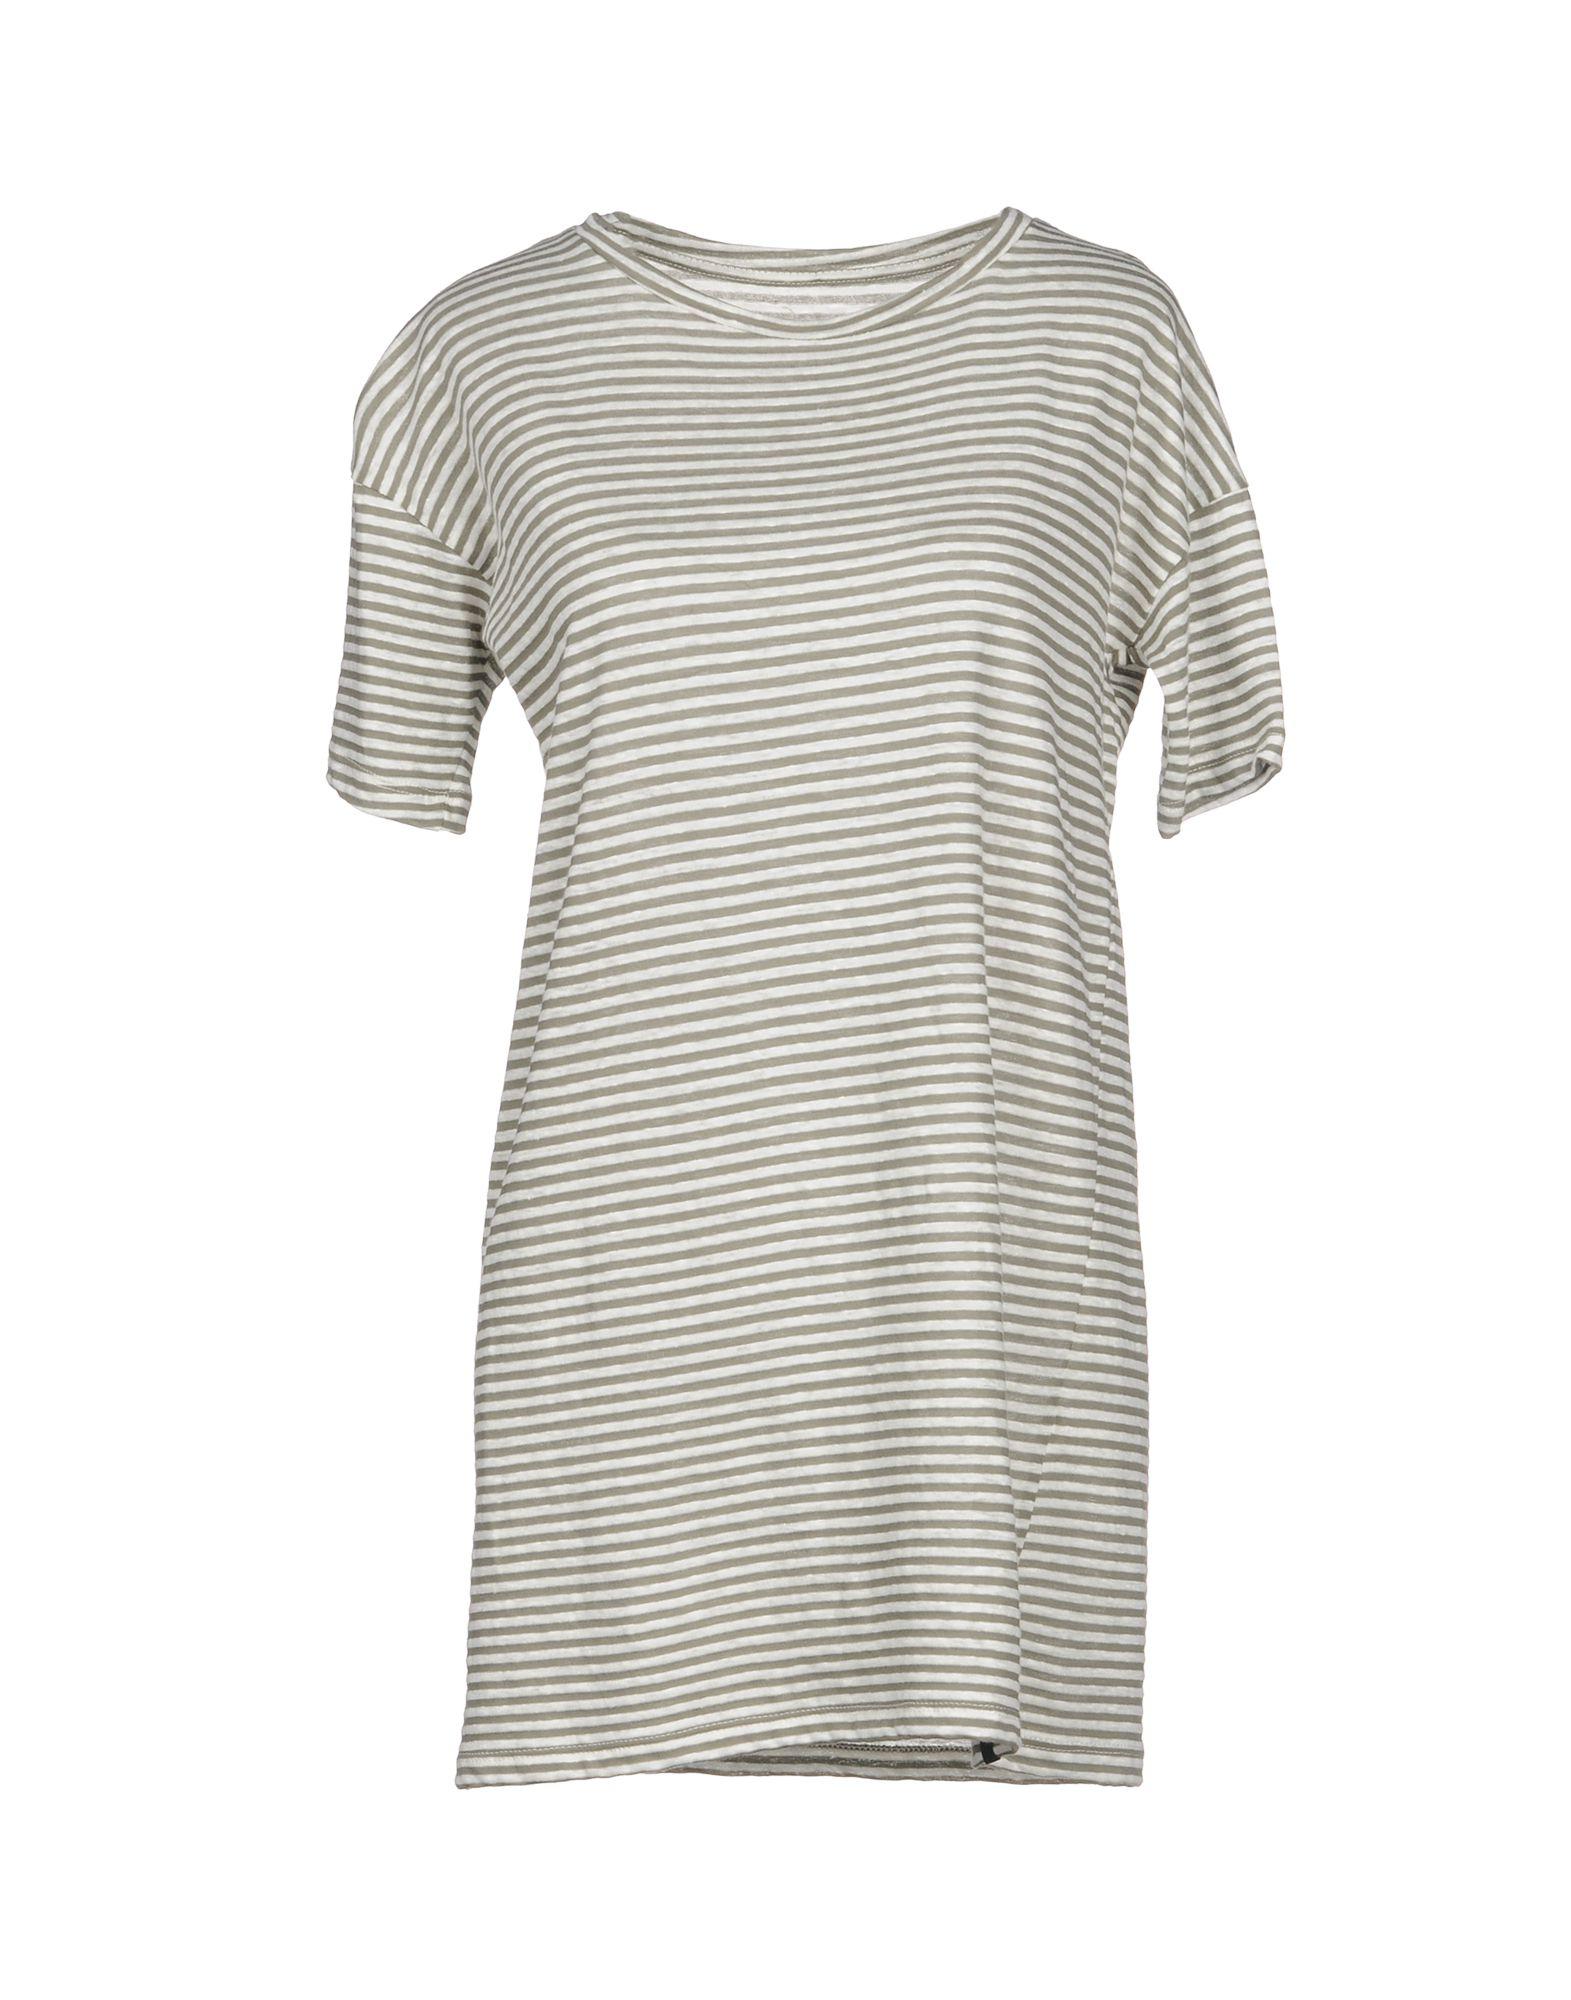 CAMISETAS Y TOPS - Camisetas de tirantes ottod´Ame 2Aox5zpk40